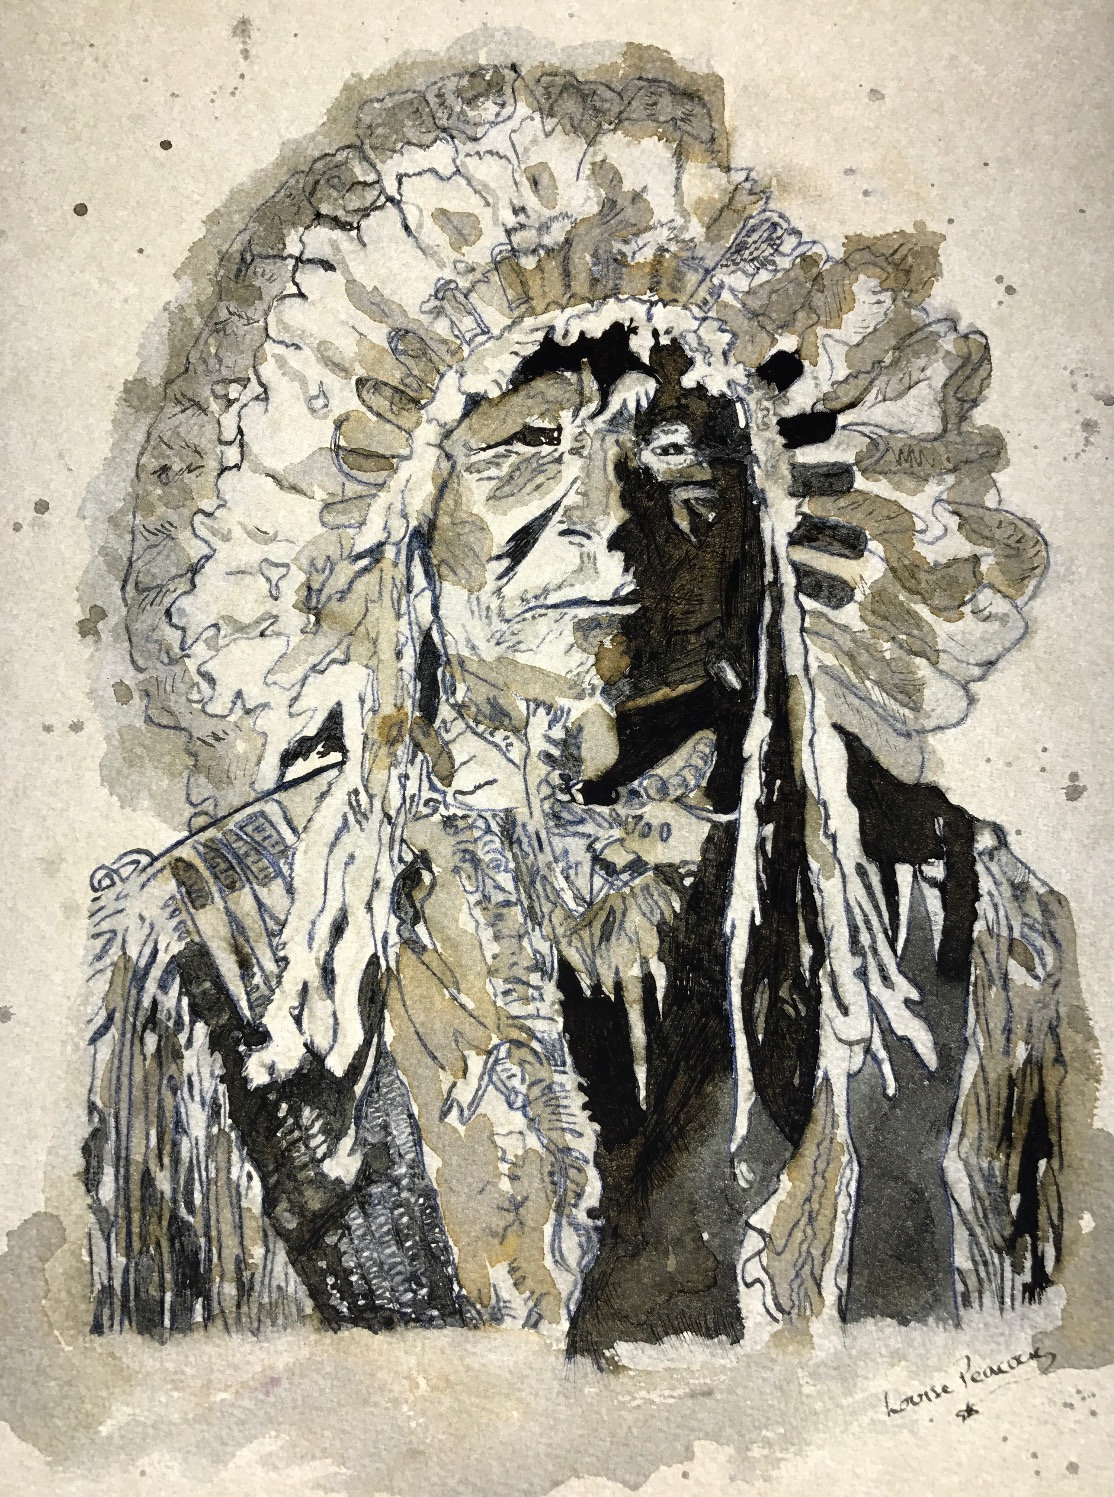 Hand drawn Ink art